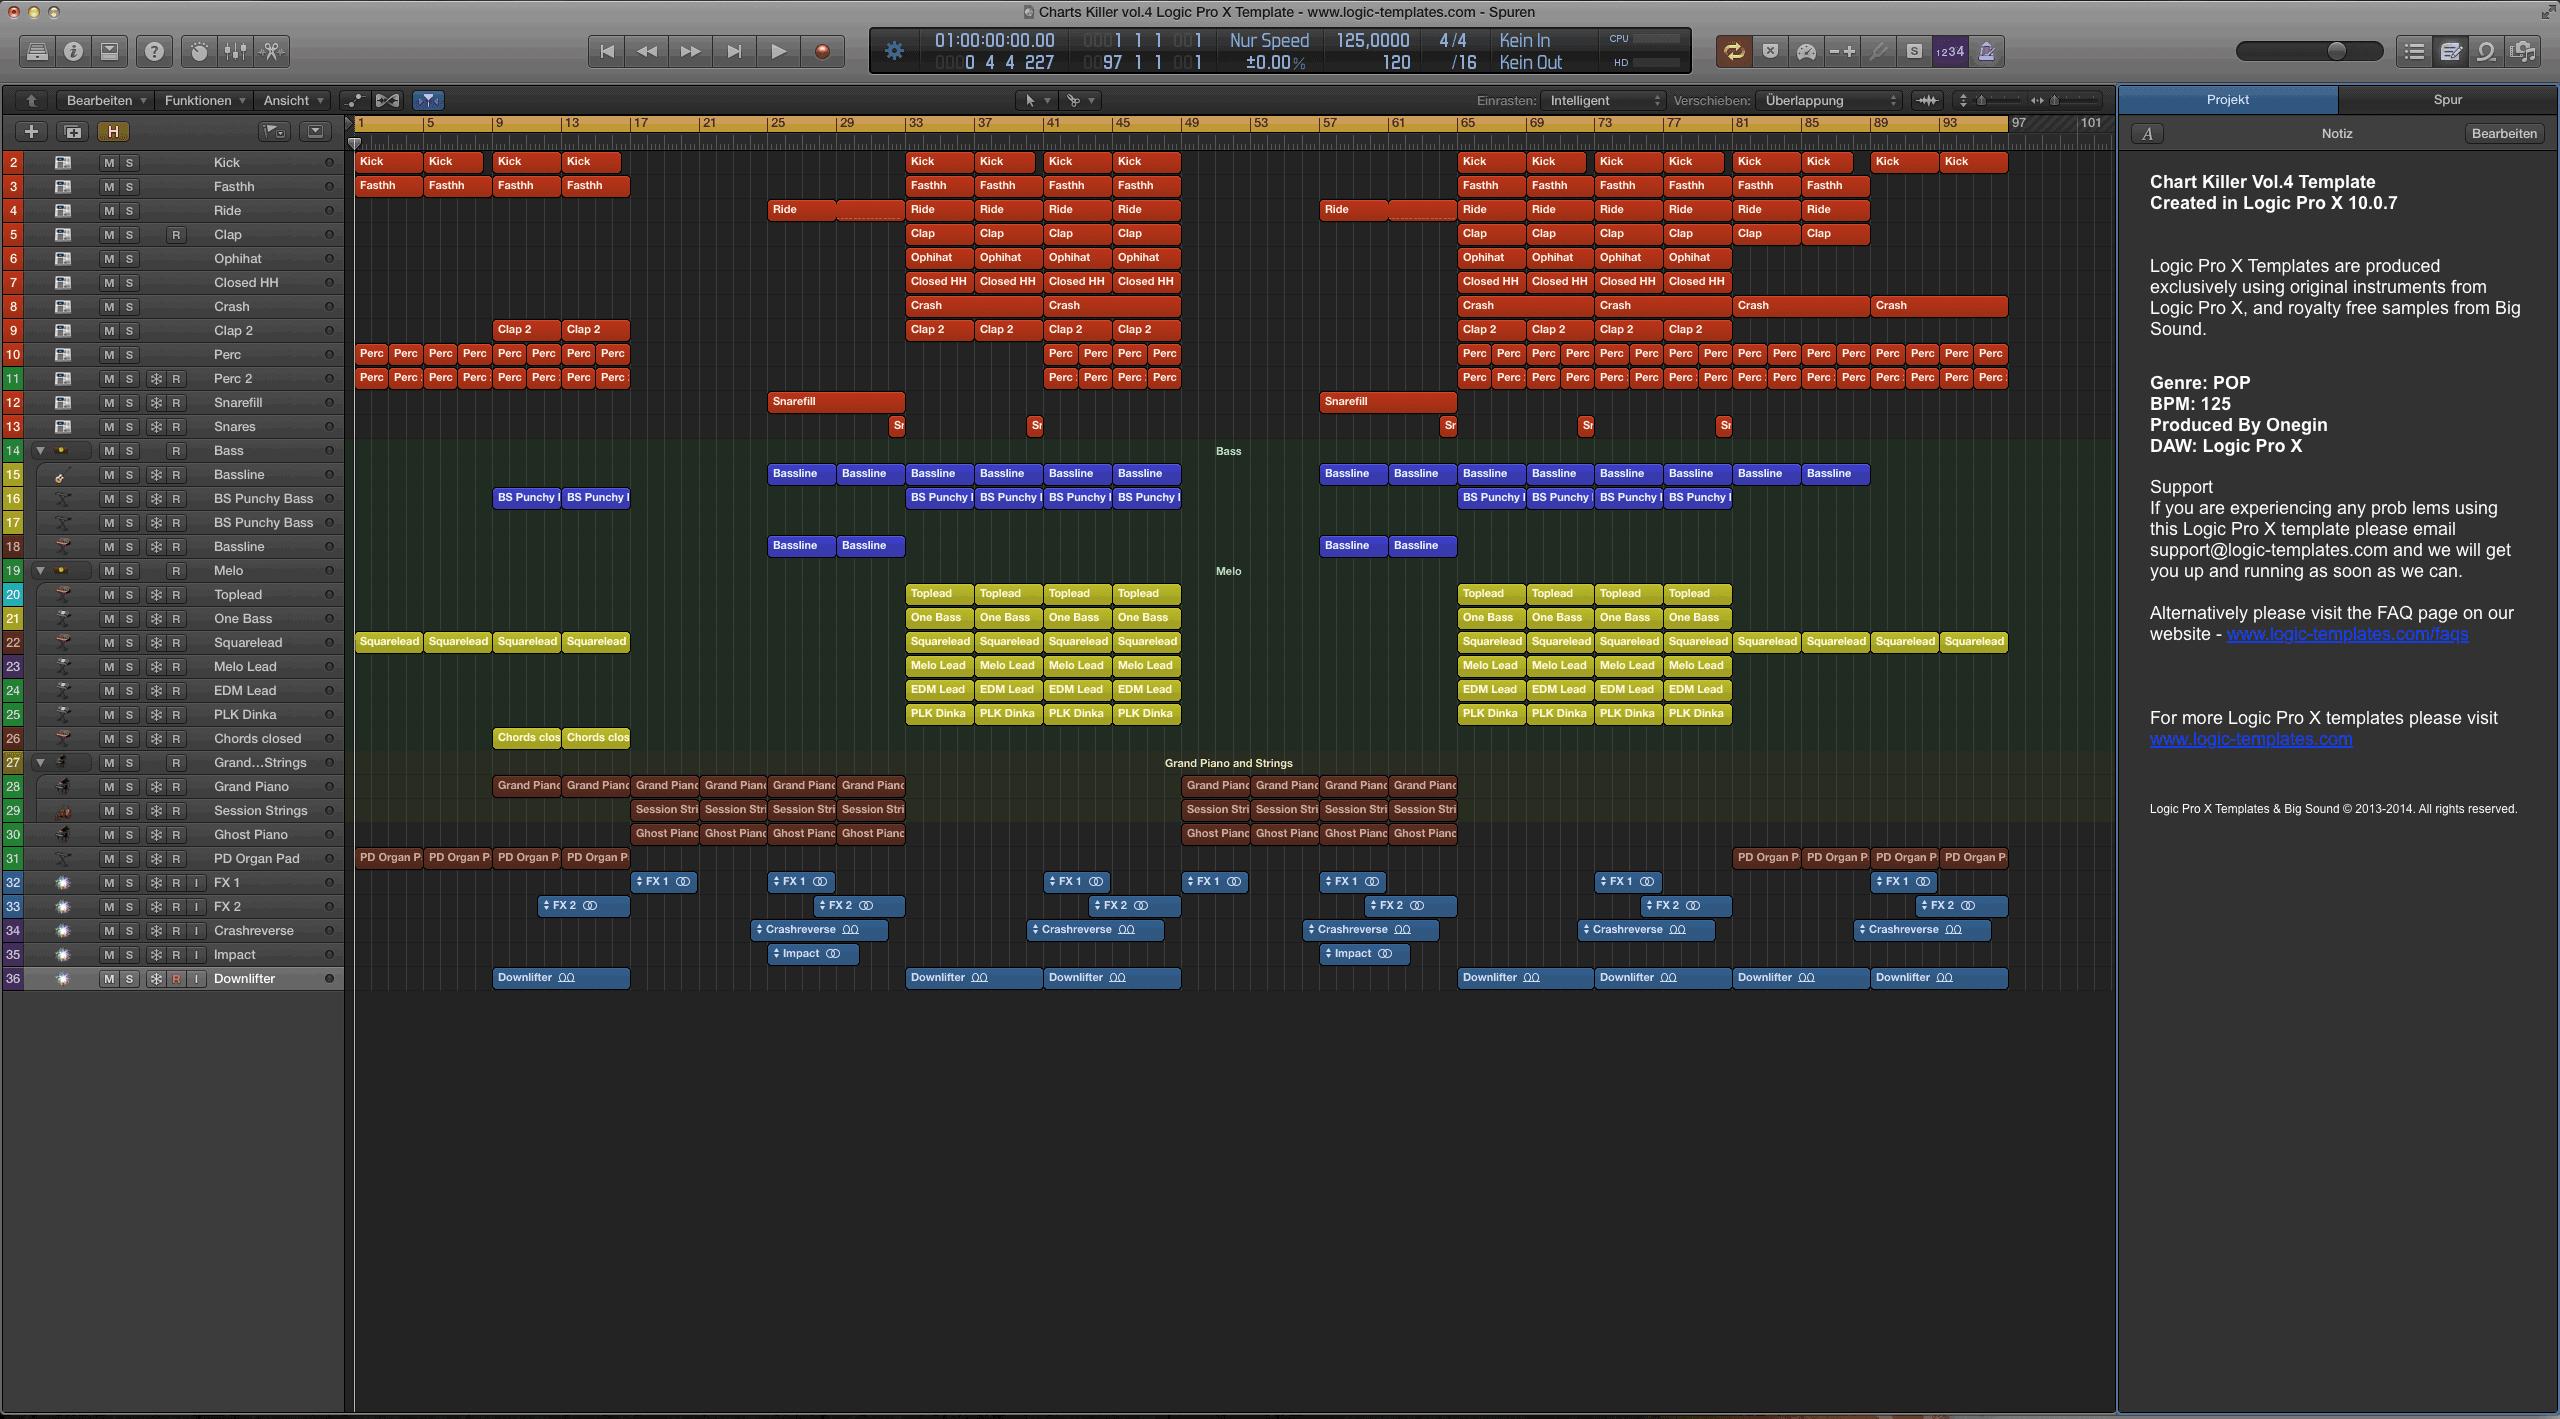 Charts Killer vol.4 Logic Pro X Template